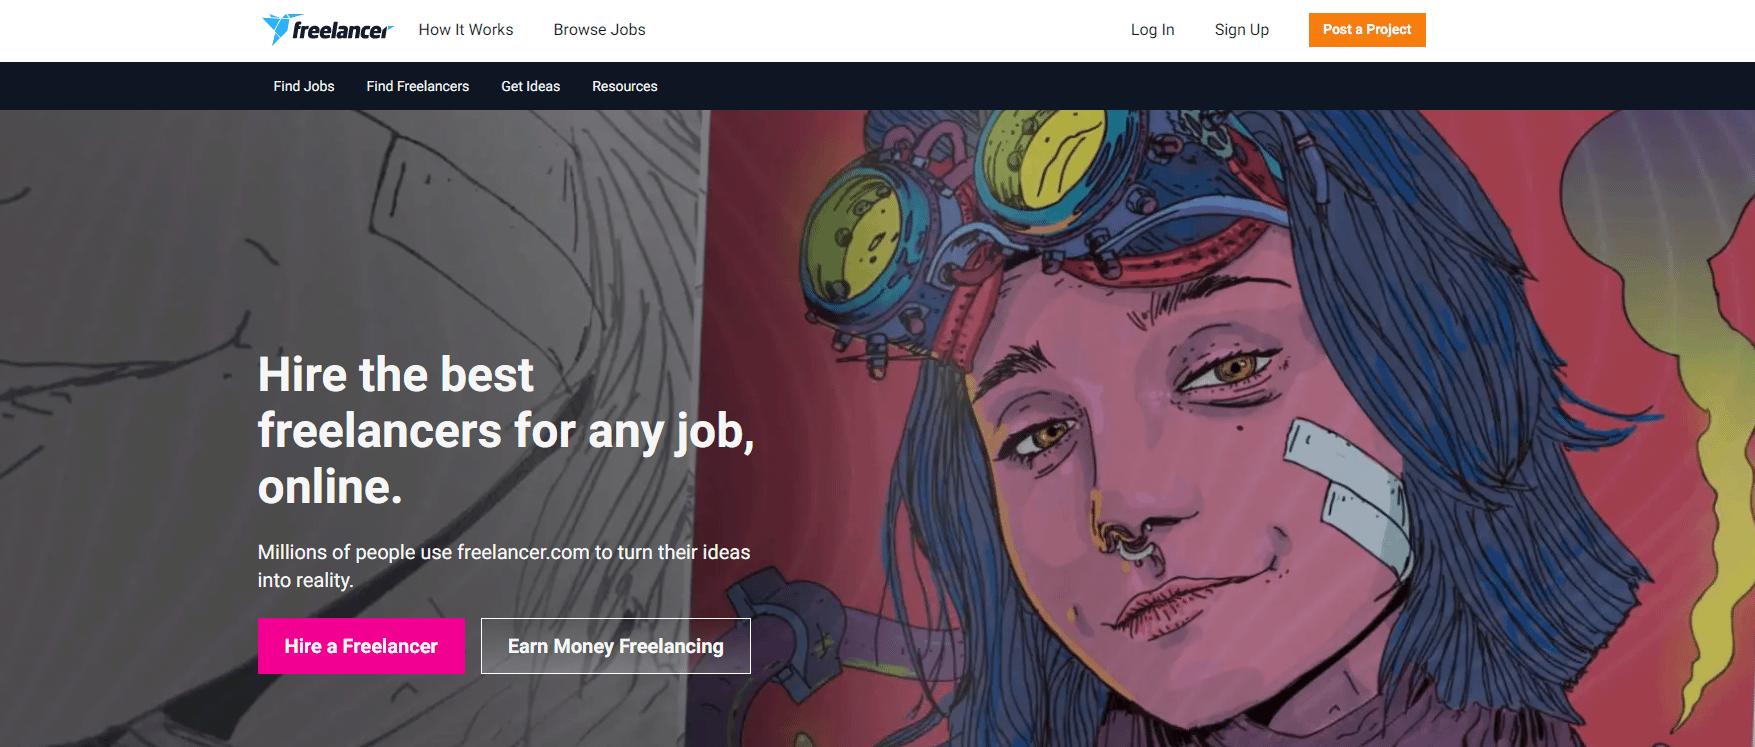 Freelancer.com主页。